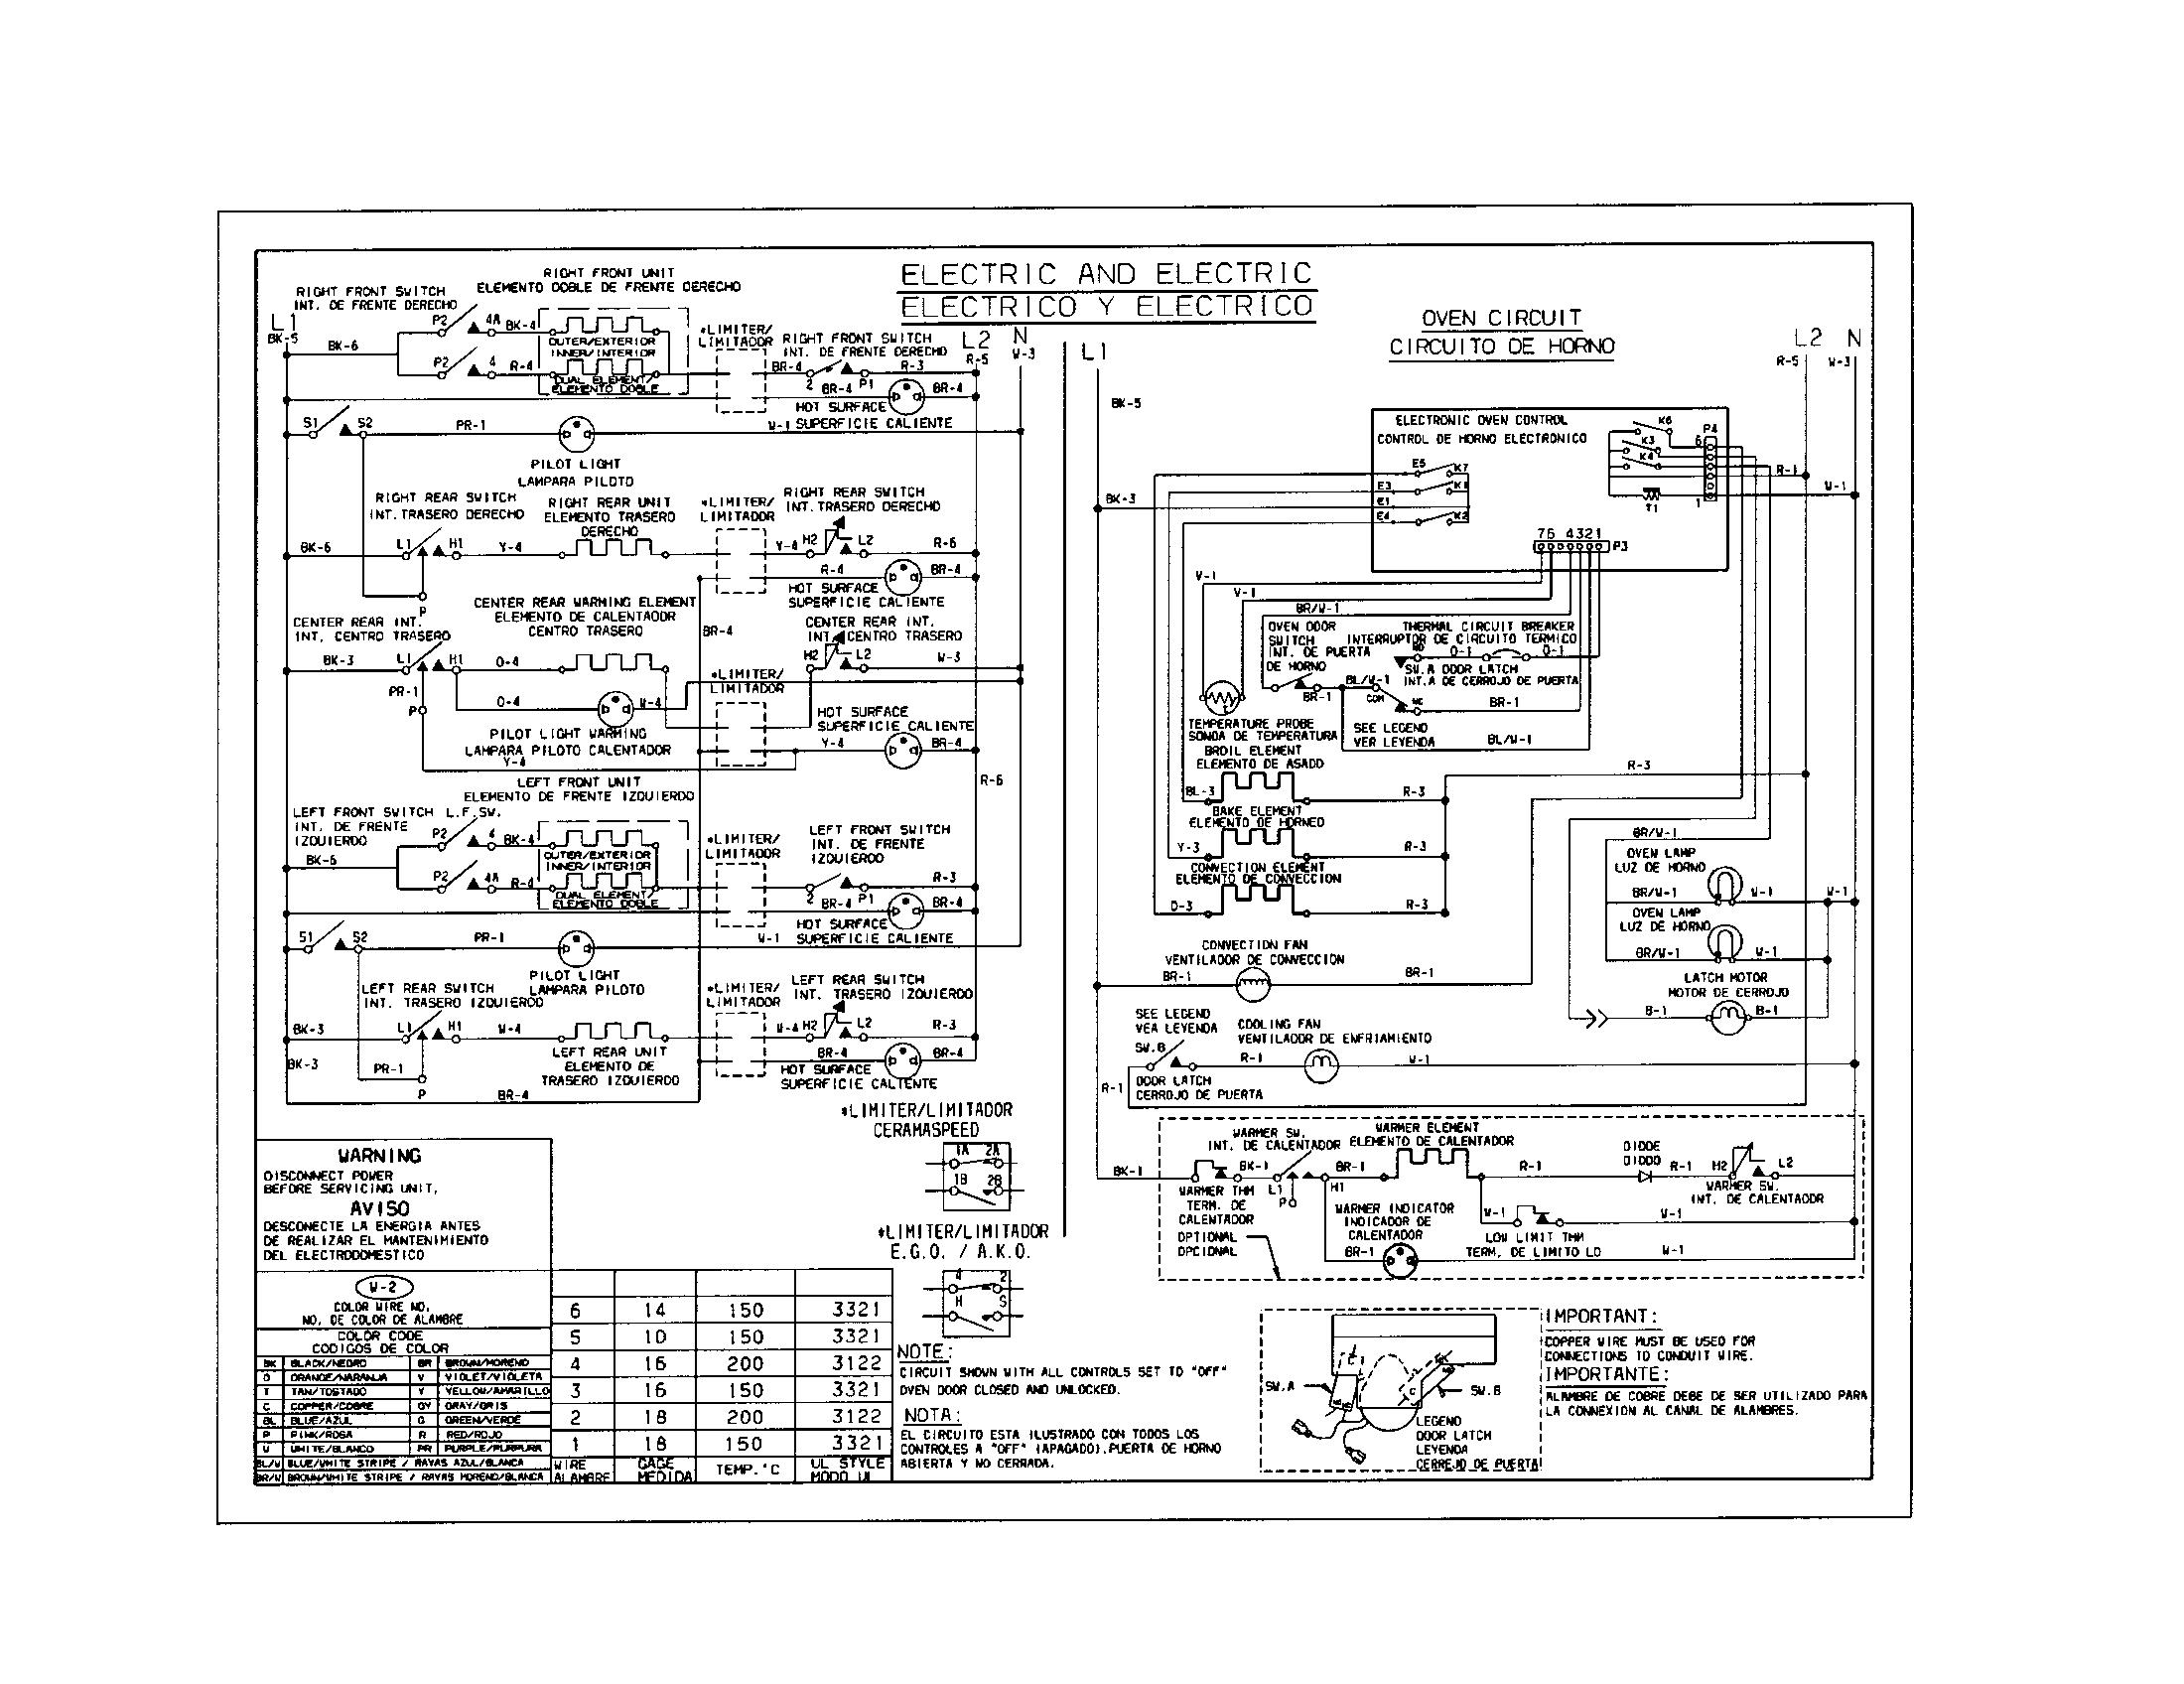 Wiring Diagram Car Wash #diagram #diagramtemplate #diagramsample | Diagram  design, Diagram, Washing machine and dryerPinterest